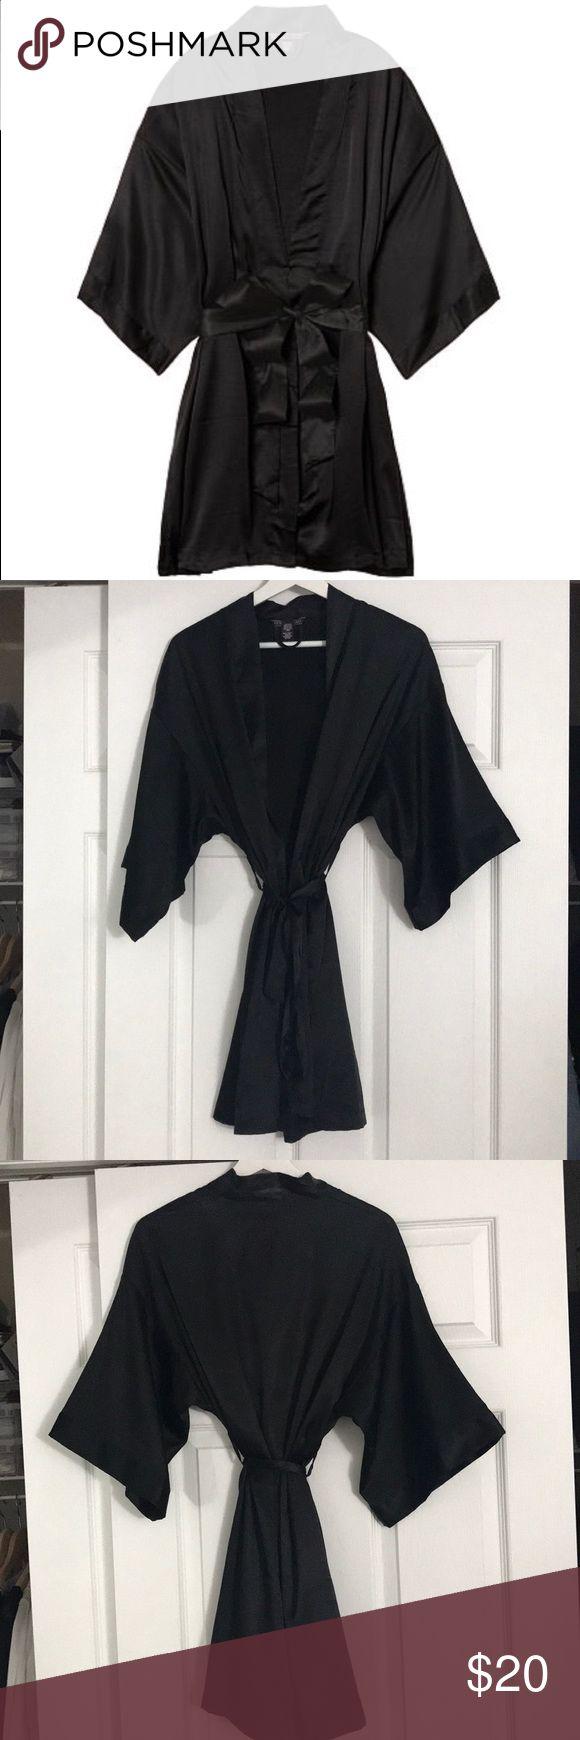 Victoria's Secret kimono robe Victoria's Secret very sexy short satin kimono robe. Adjustable waist tie. Two front pockets. No trades. Offers welcome. Victoria's Secret Intimates & Sleepwear Robes